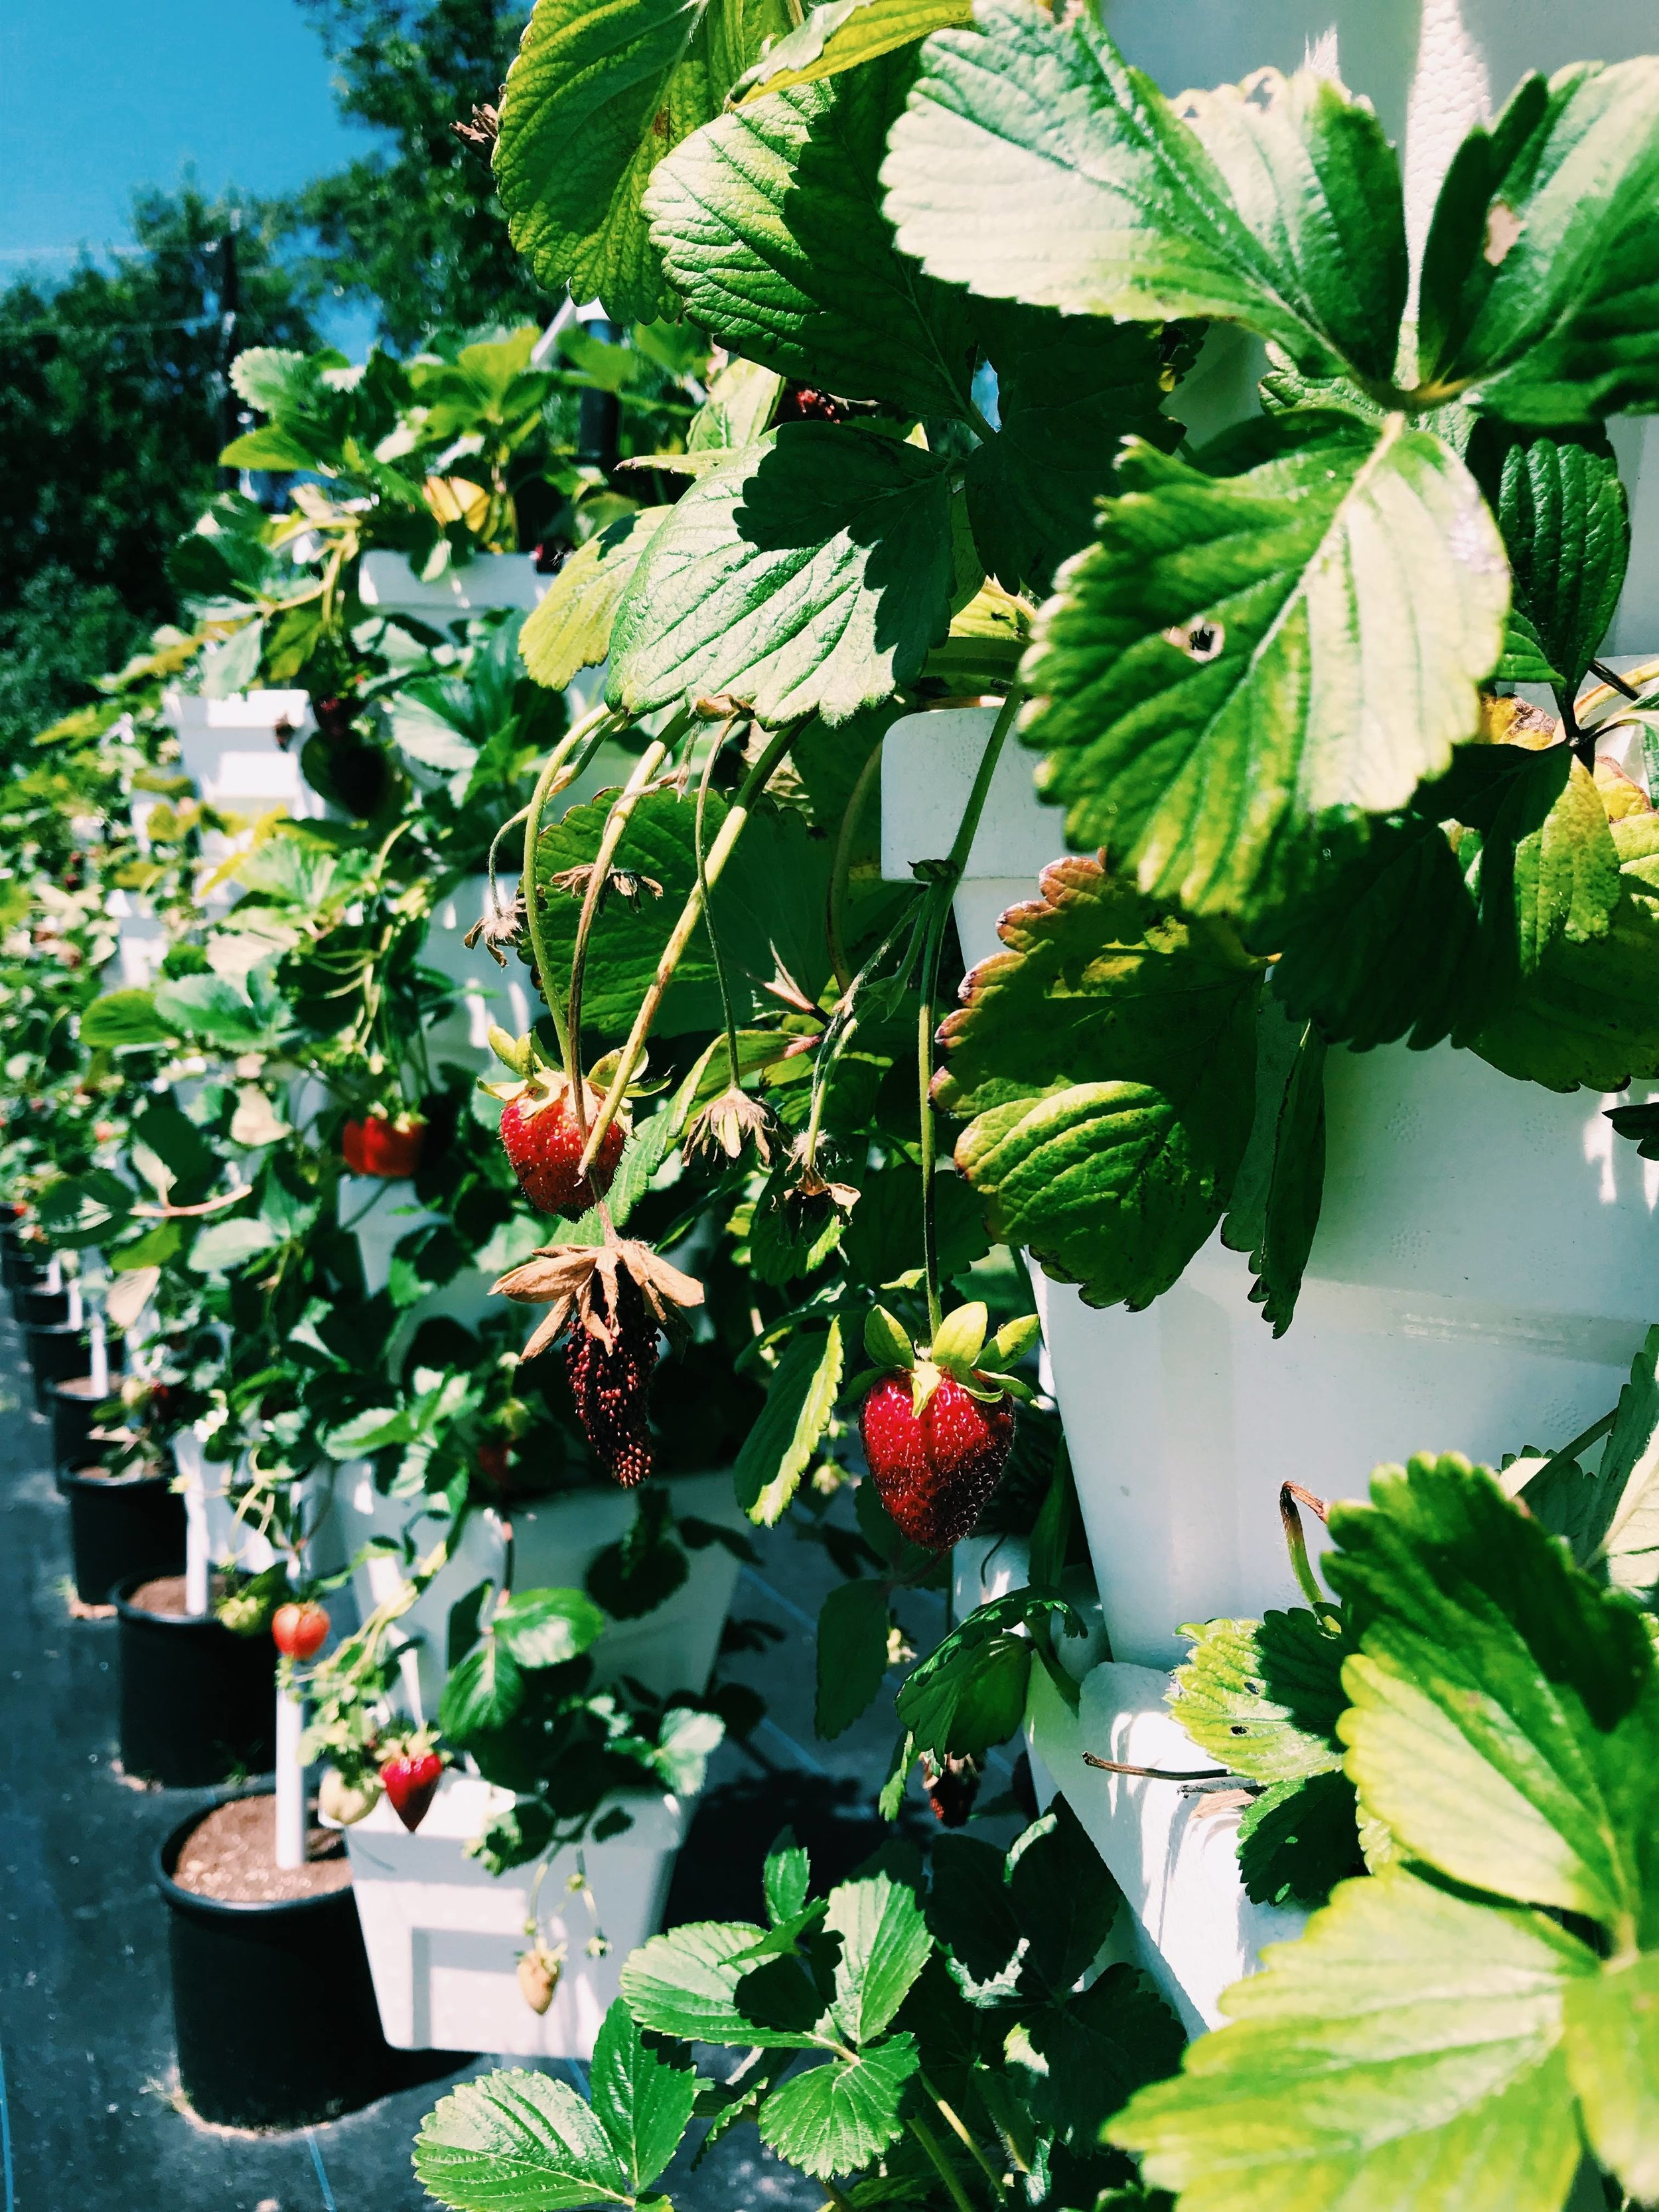 Three Heel Clicks - Strawberry Picking at Atkinson's Farms (8).jpg